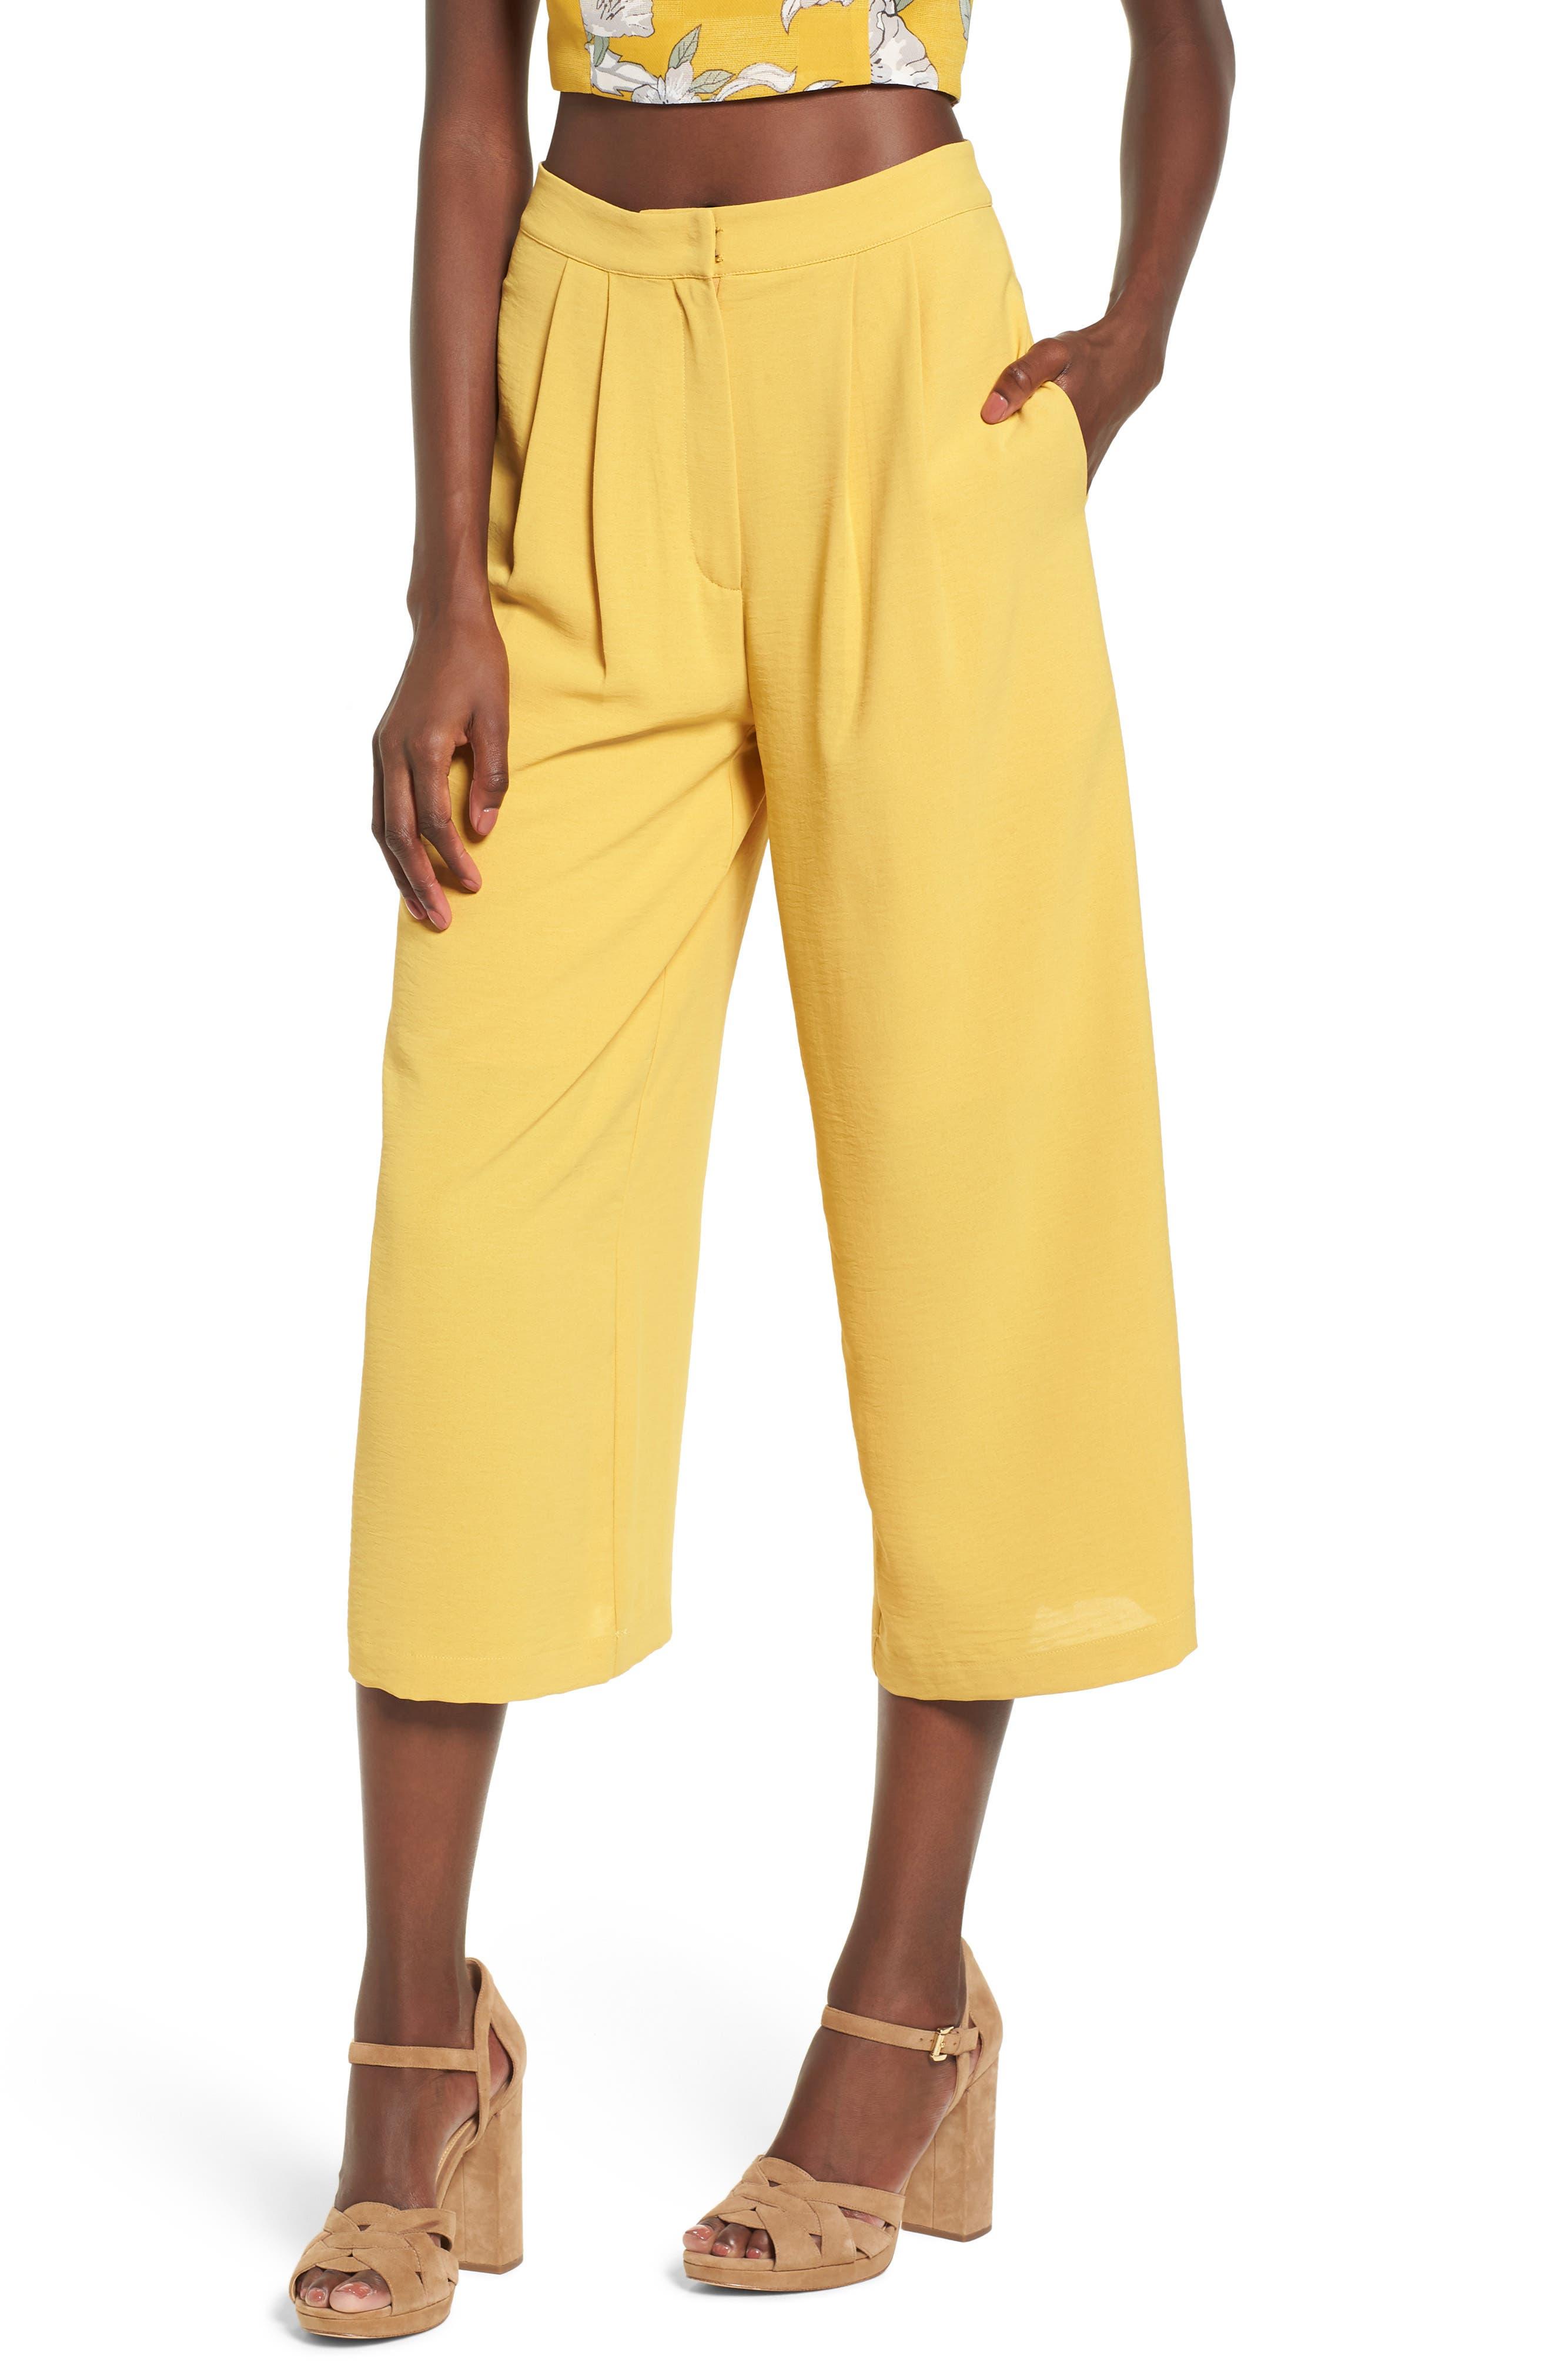 Main Image - Chriselle x J.O.A. Pleat High Waist Crop Wide Leg Pants